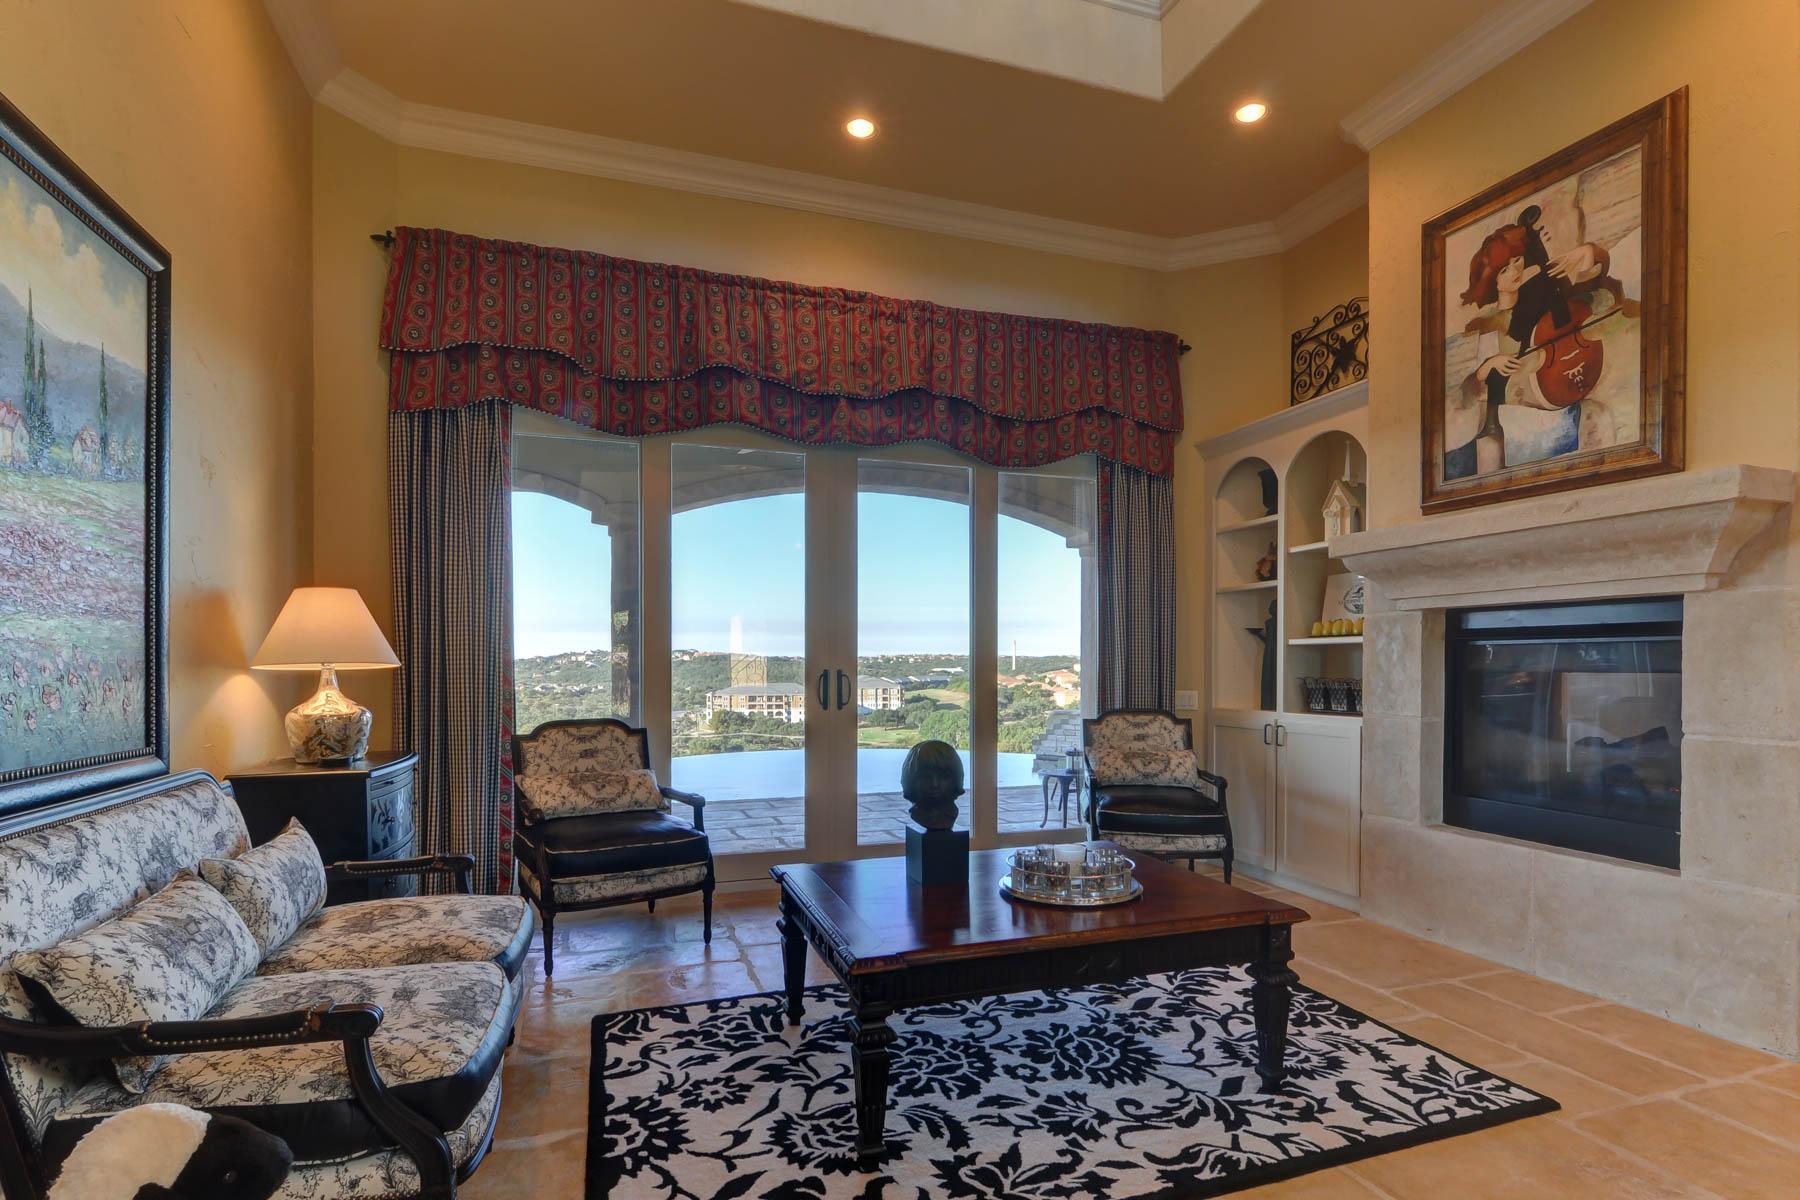 Additional photo for property listing at Million-Dollar Views in Summerglen 24803 Parview Cir San Antonio, Texas 78260 Estados Unidos